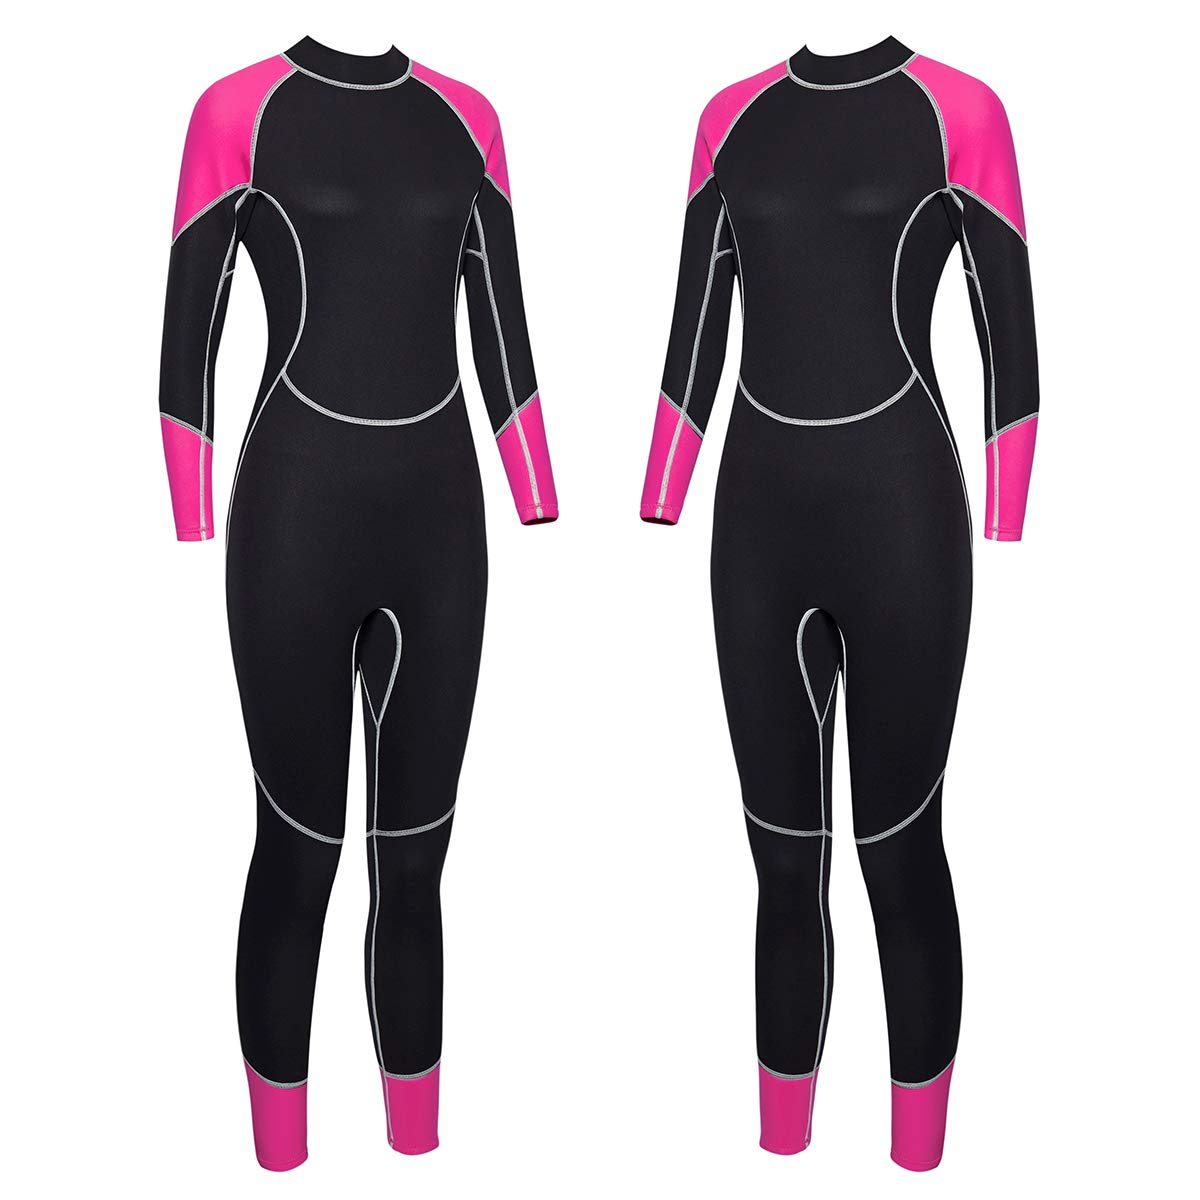 Niiwi Women Full Body Wetsuit - 2.5mm Premium, Women Pink/Black, Size Large by Niiwi